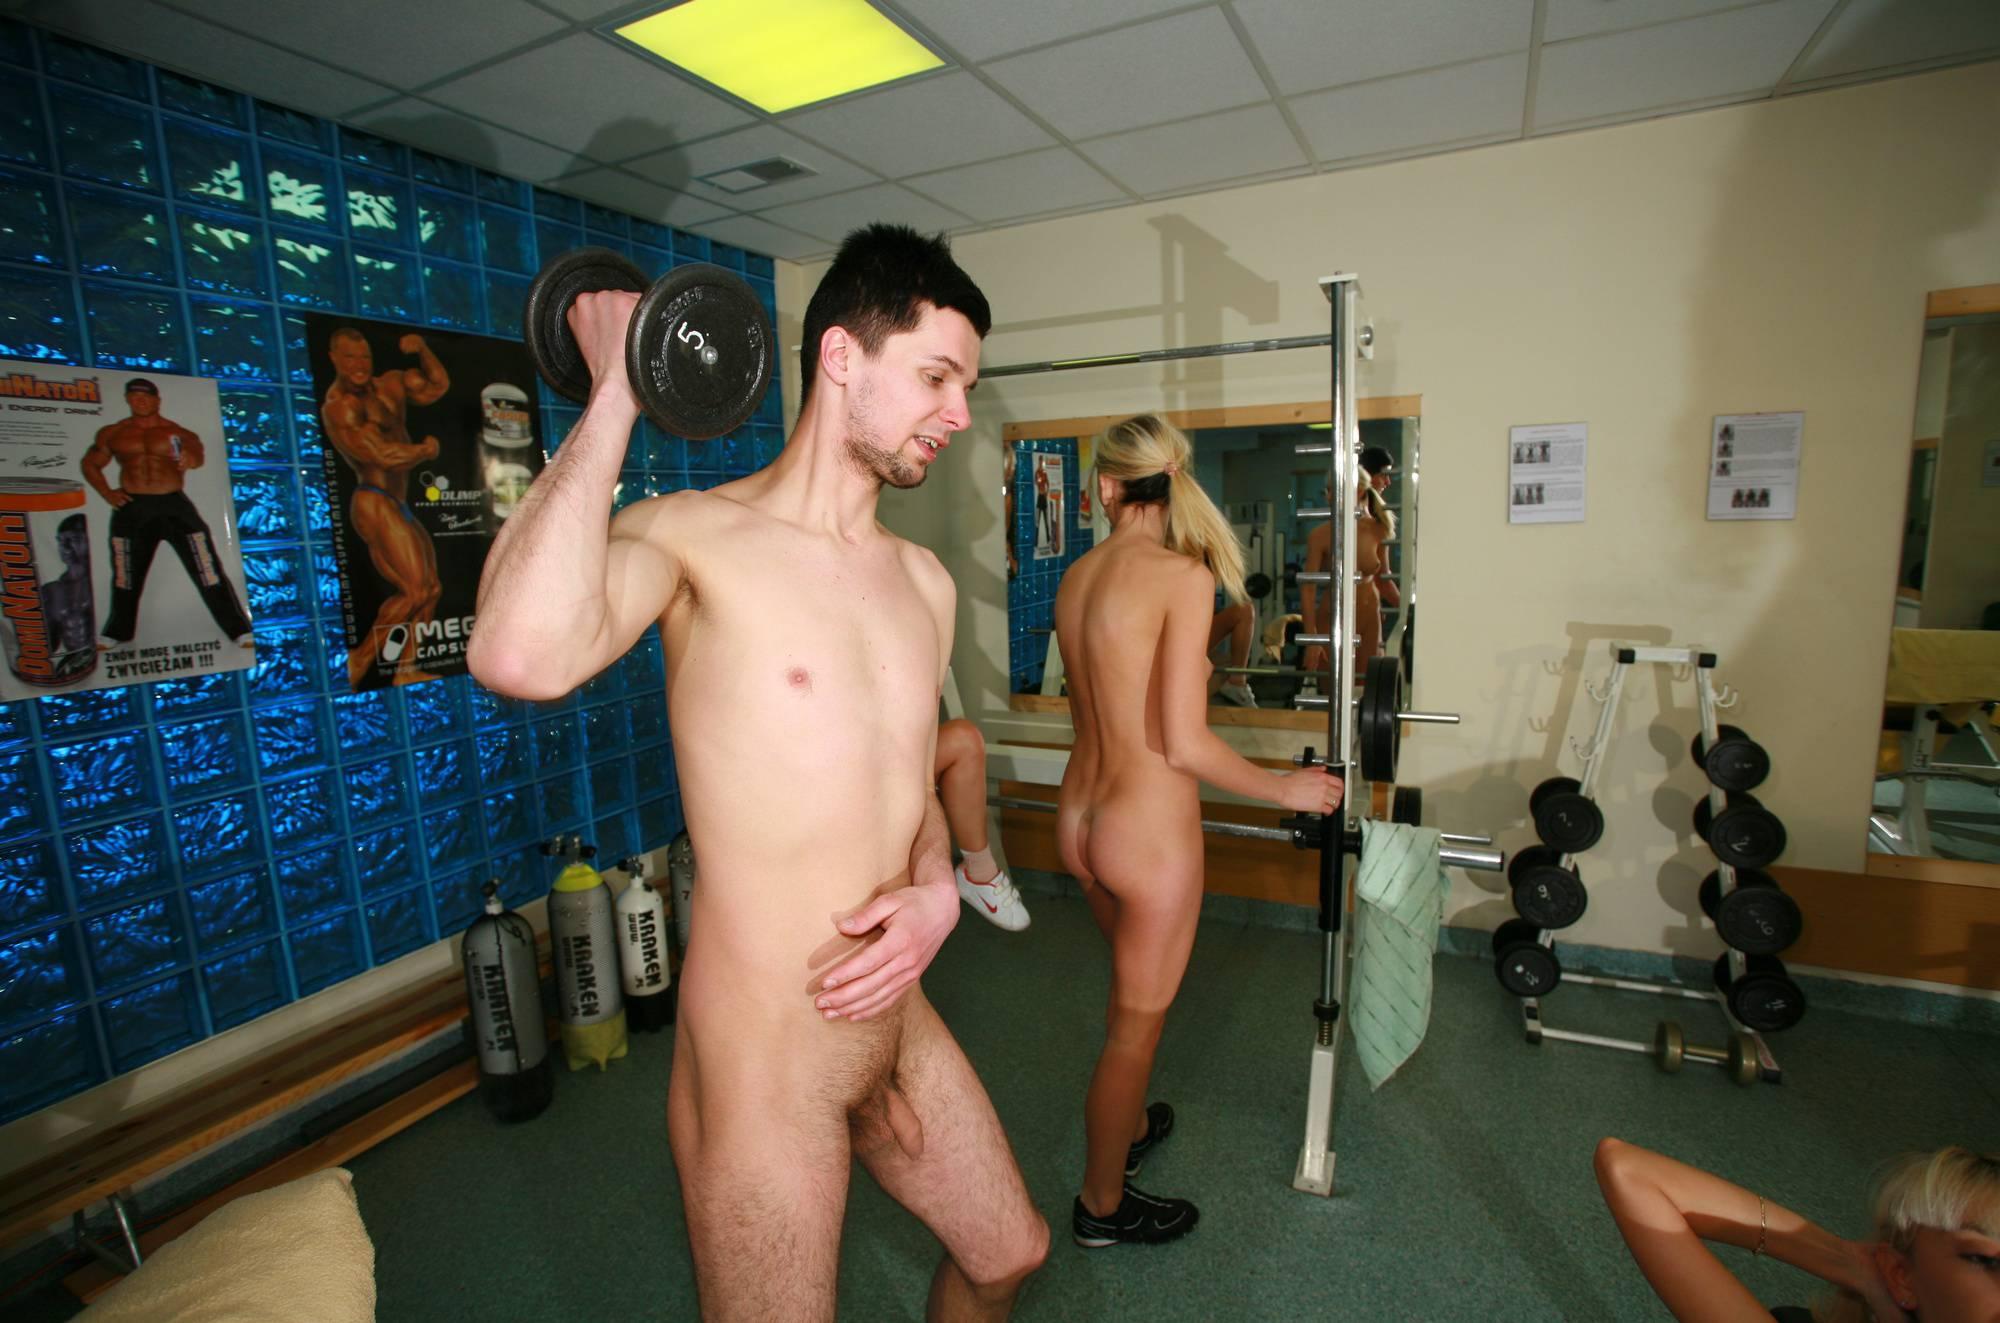 Nudist Gallery Scuba Gym 3rd Workout - 2